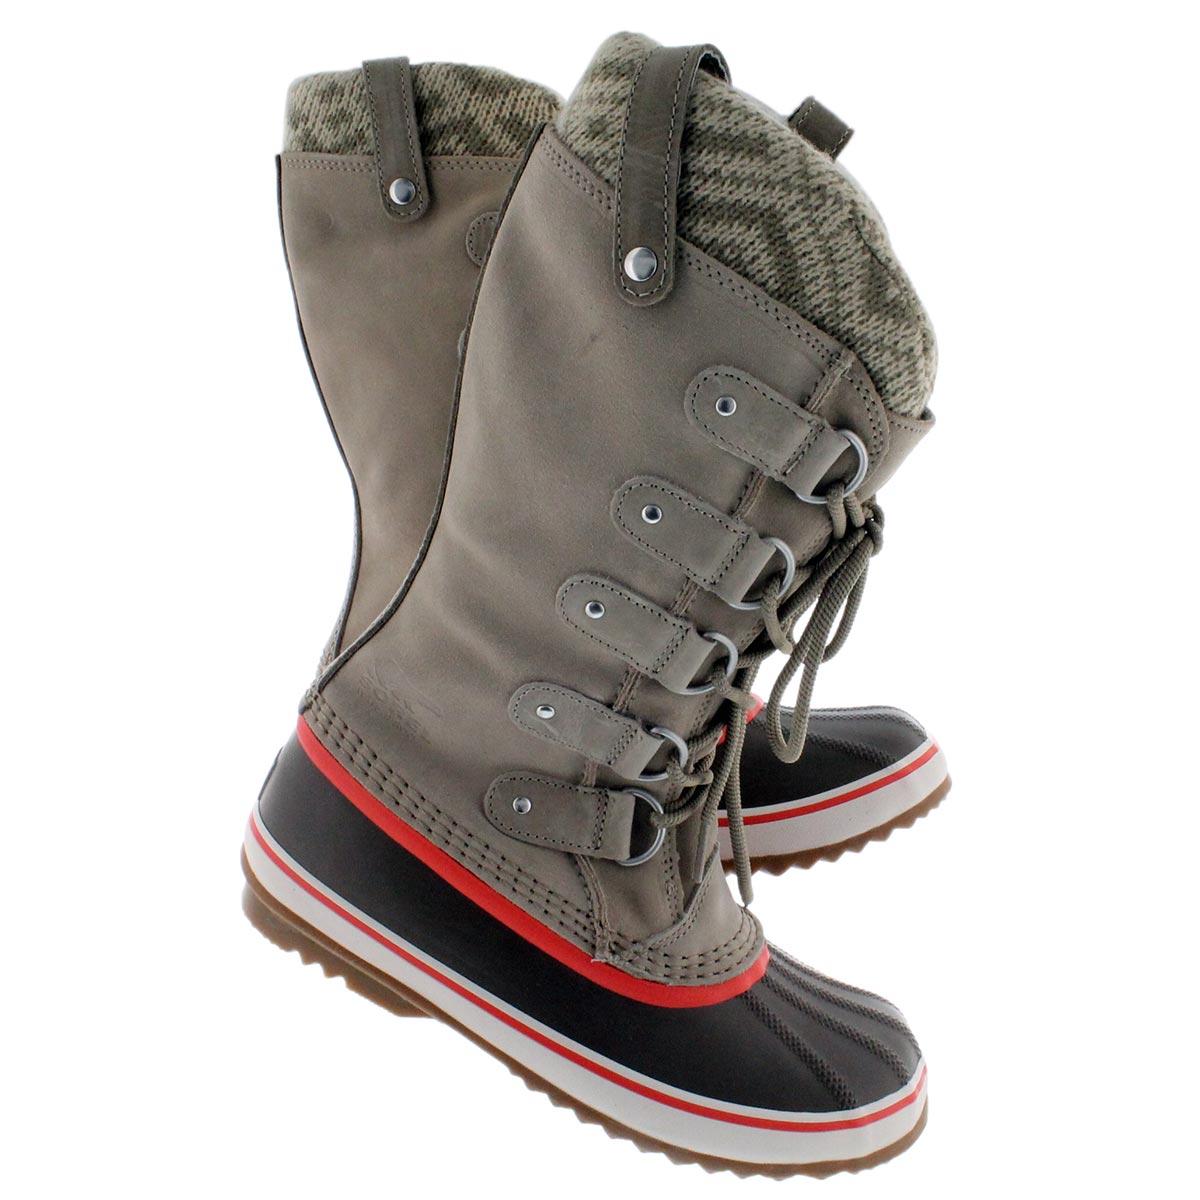 Sorel women s joan of arctic knit fossil winter boots 1553291 160